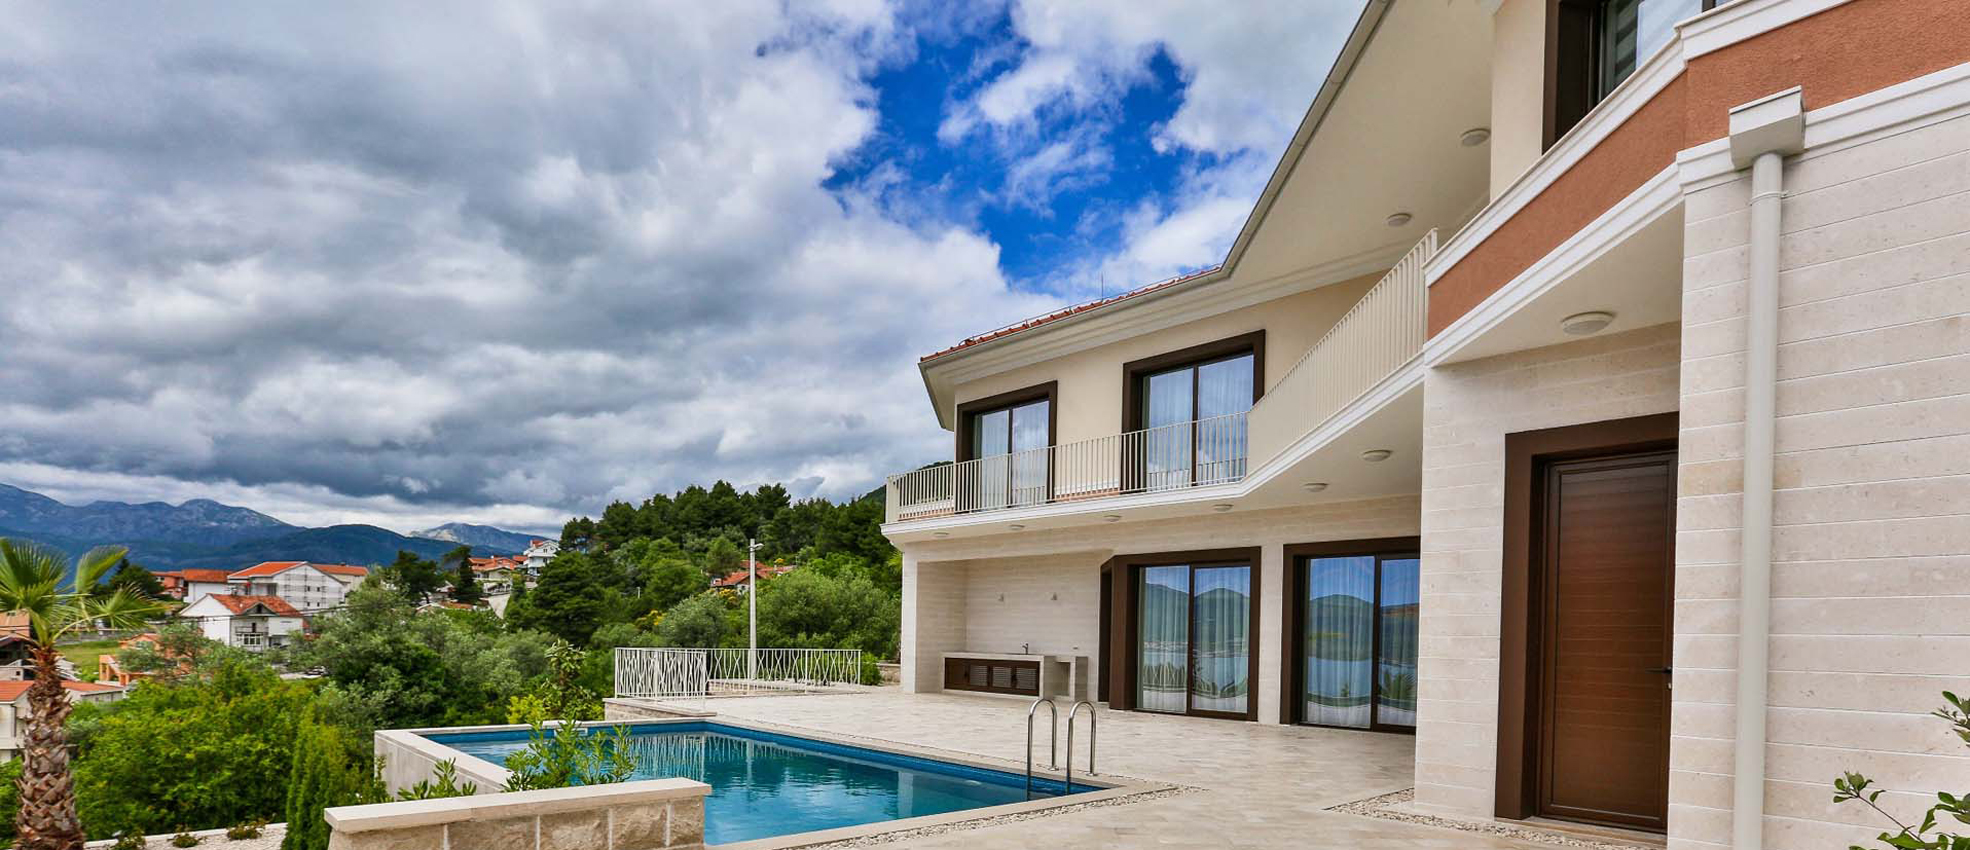 Moderna vila na popularnoj lokaciji Tivat